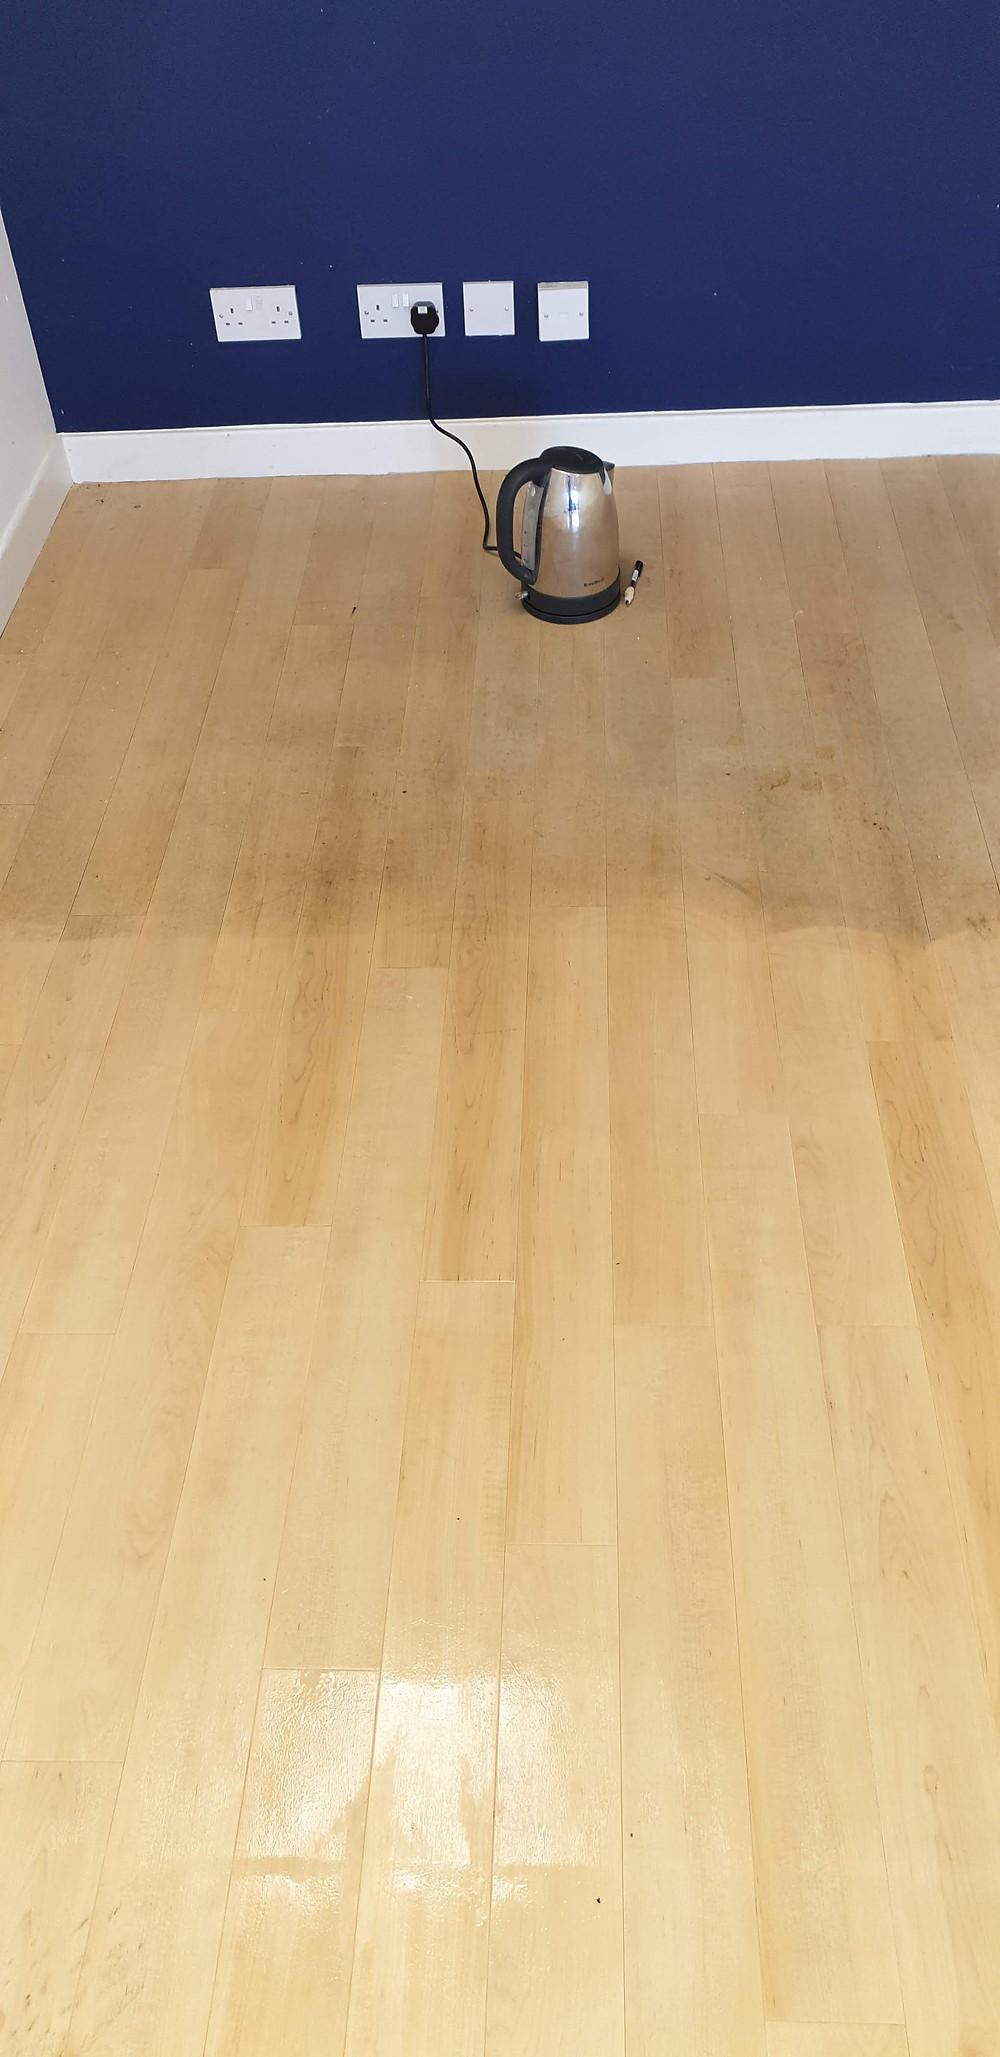 Vinyl floor cleaning Ayrshire